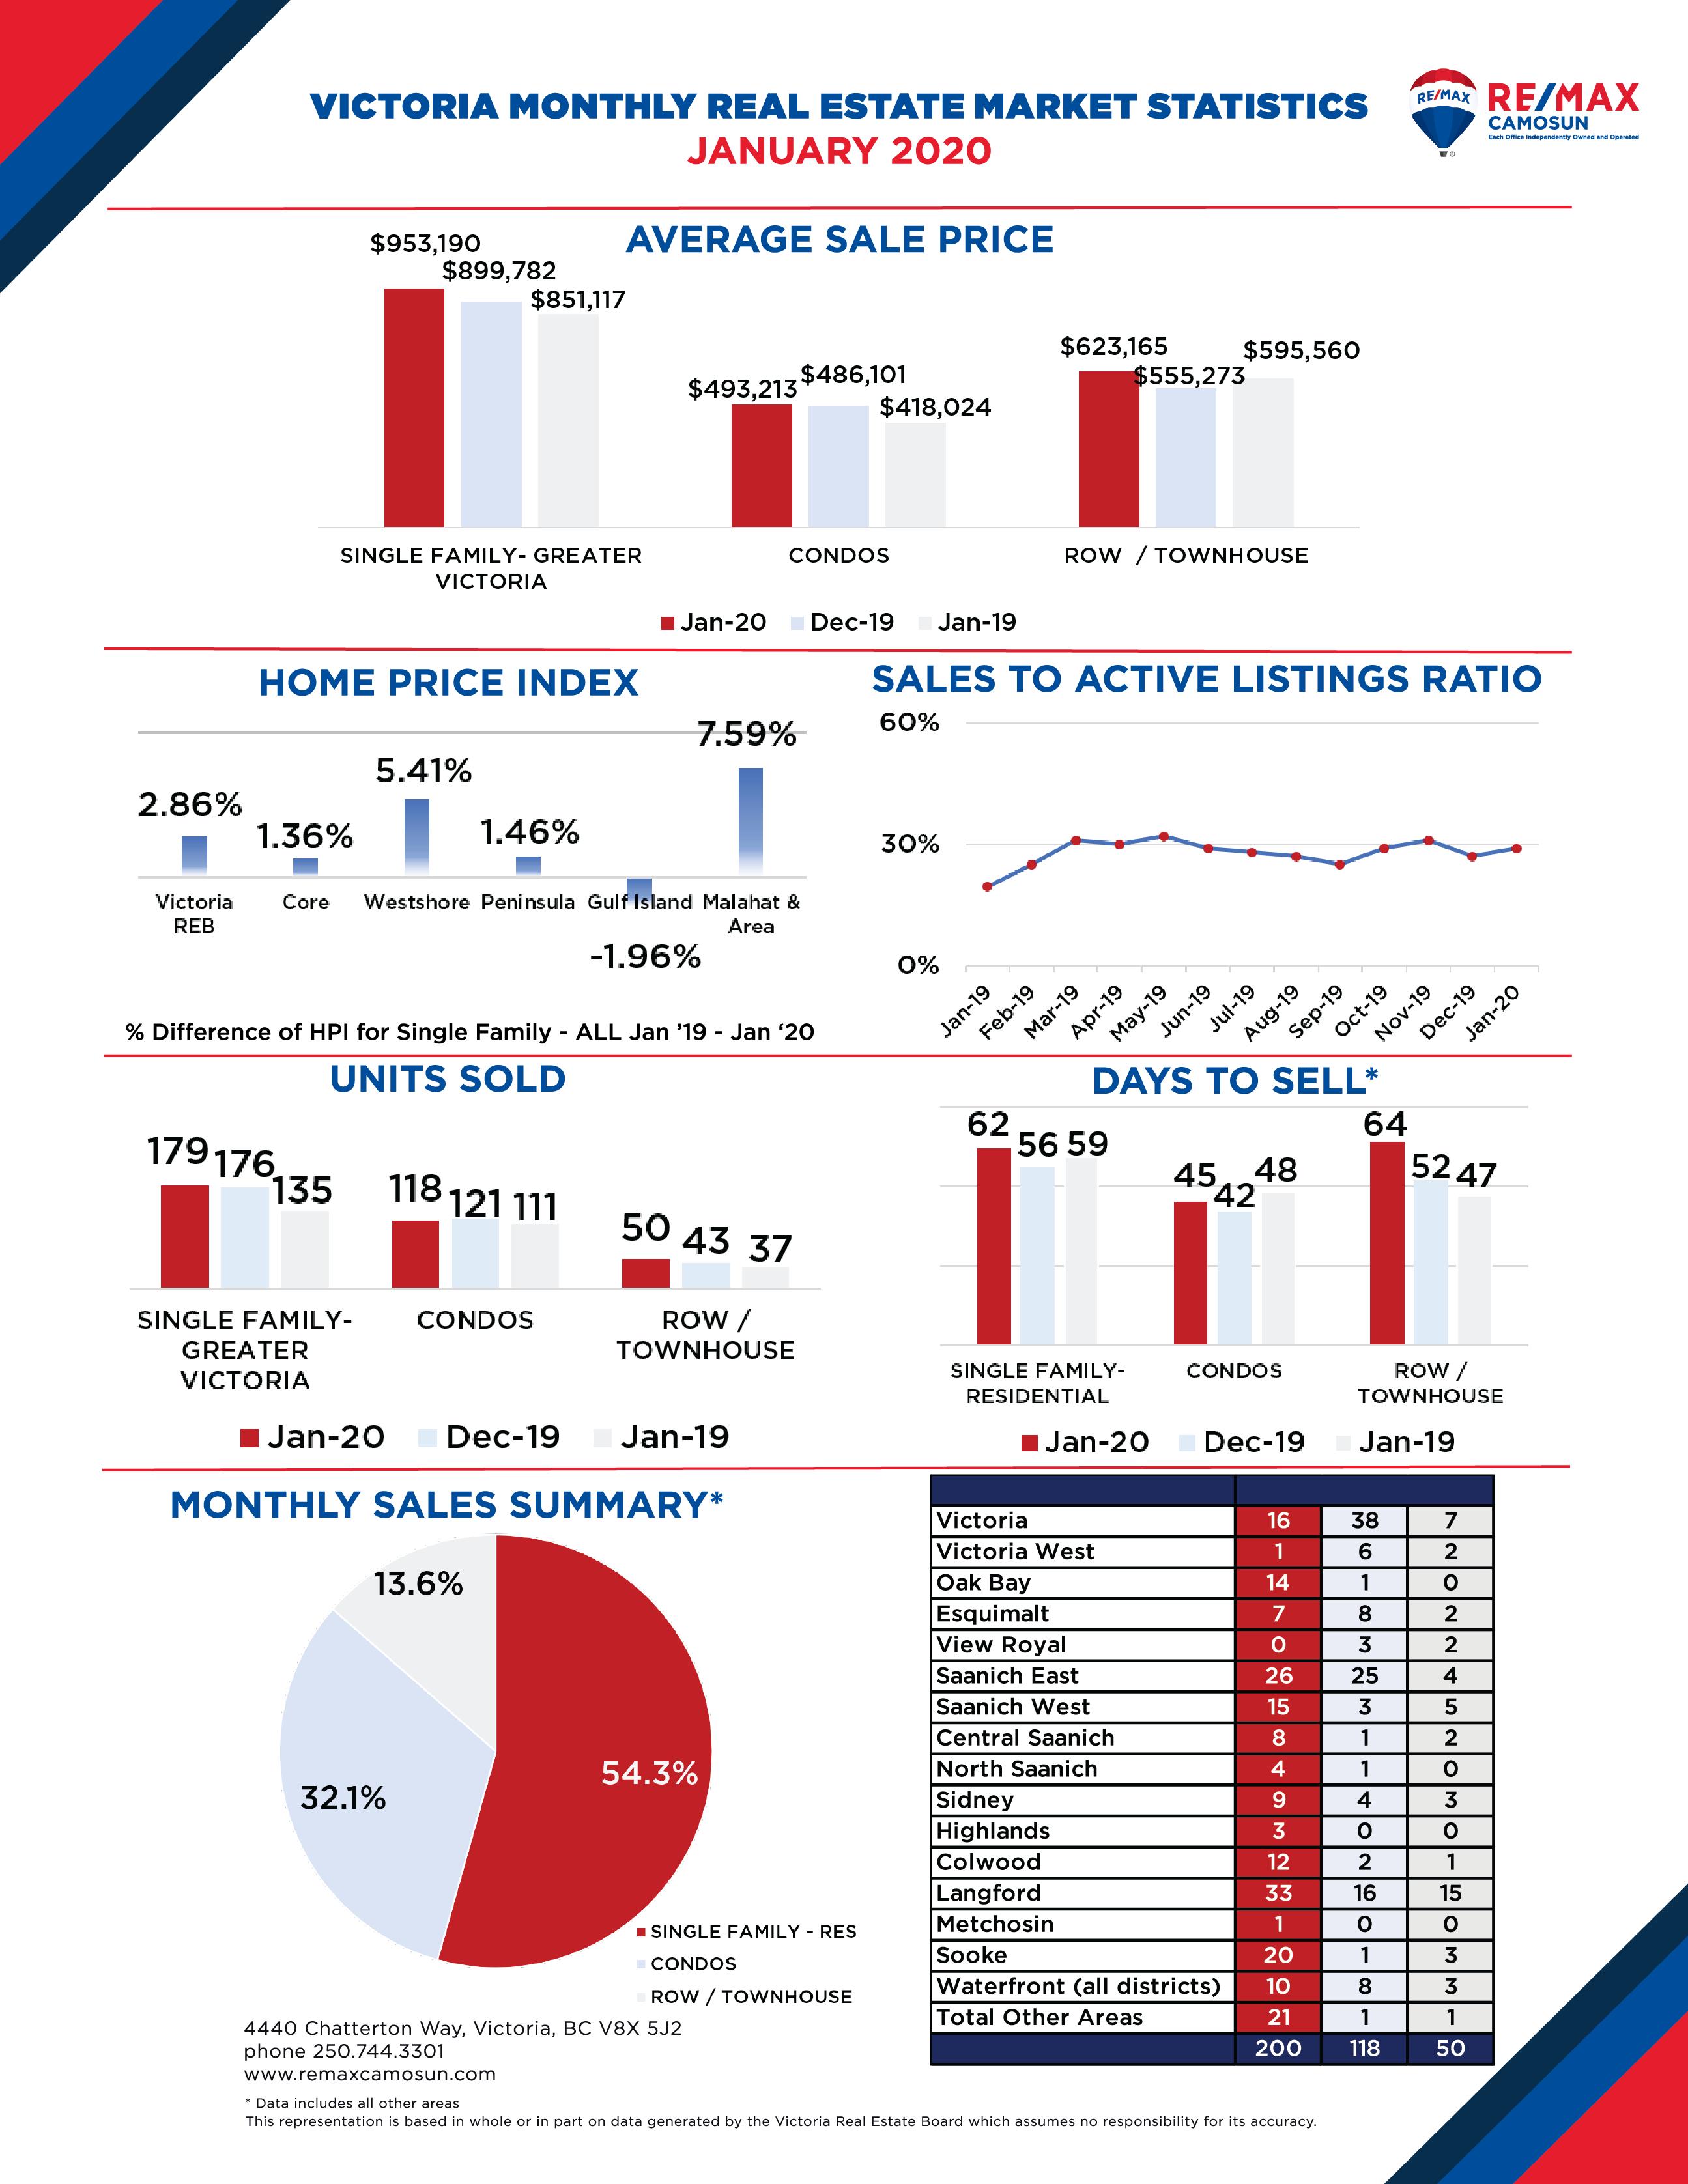 December 2019 Victoria Real Estate Market